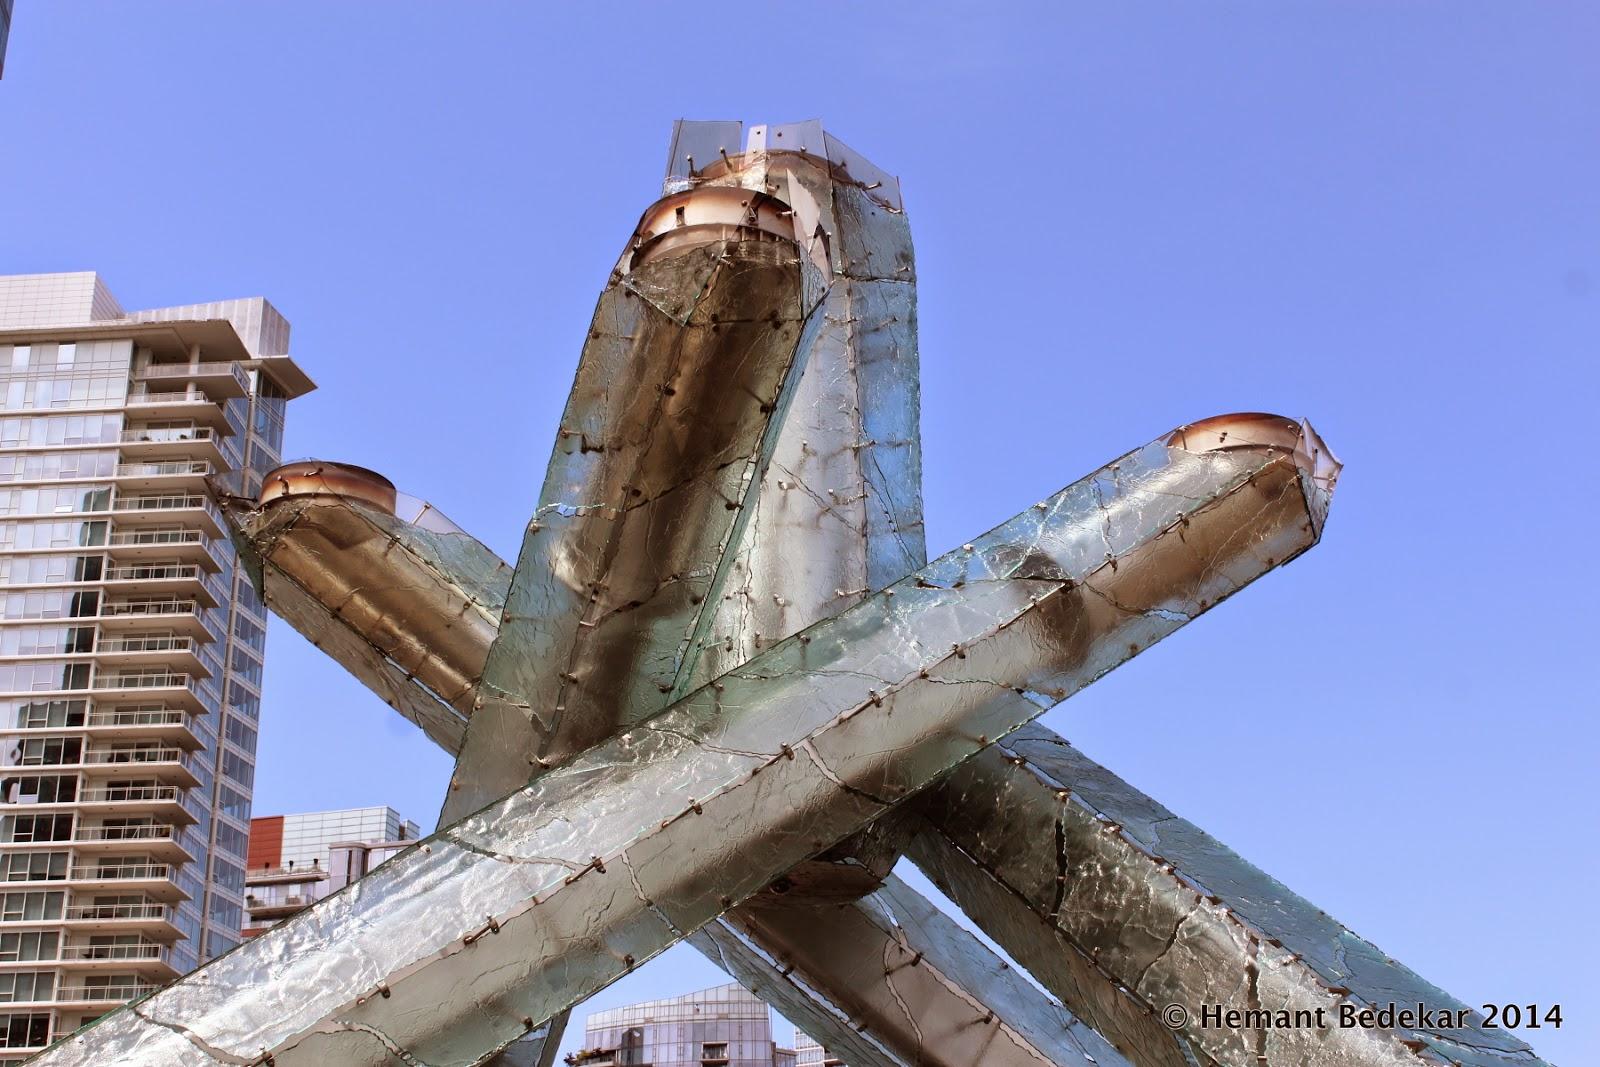 Vancouver Winter Olympics 2010 Cauldron